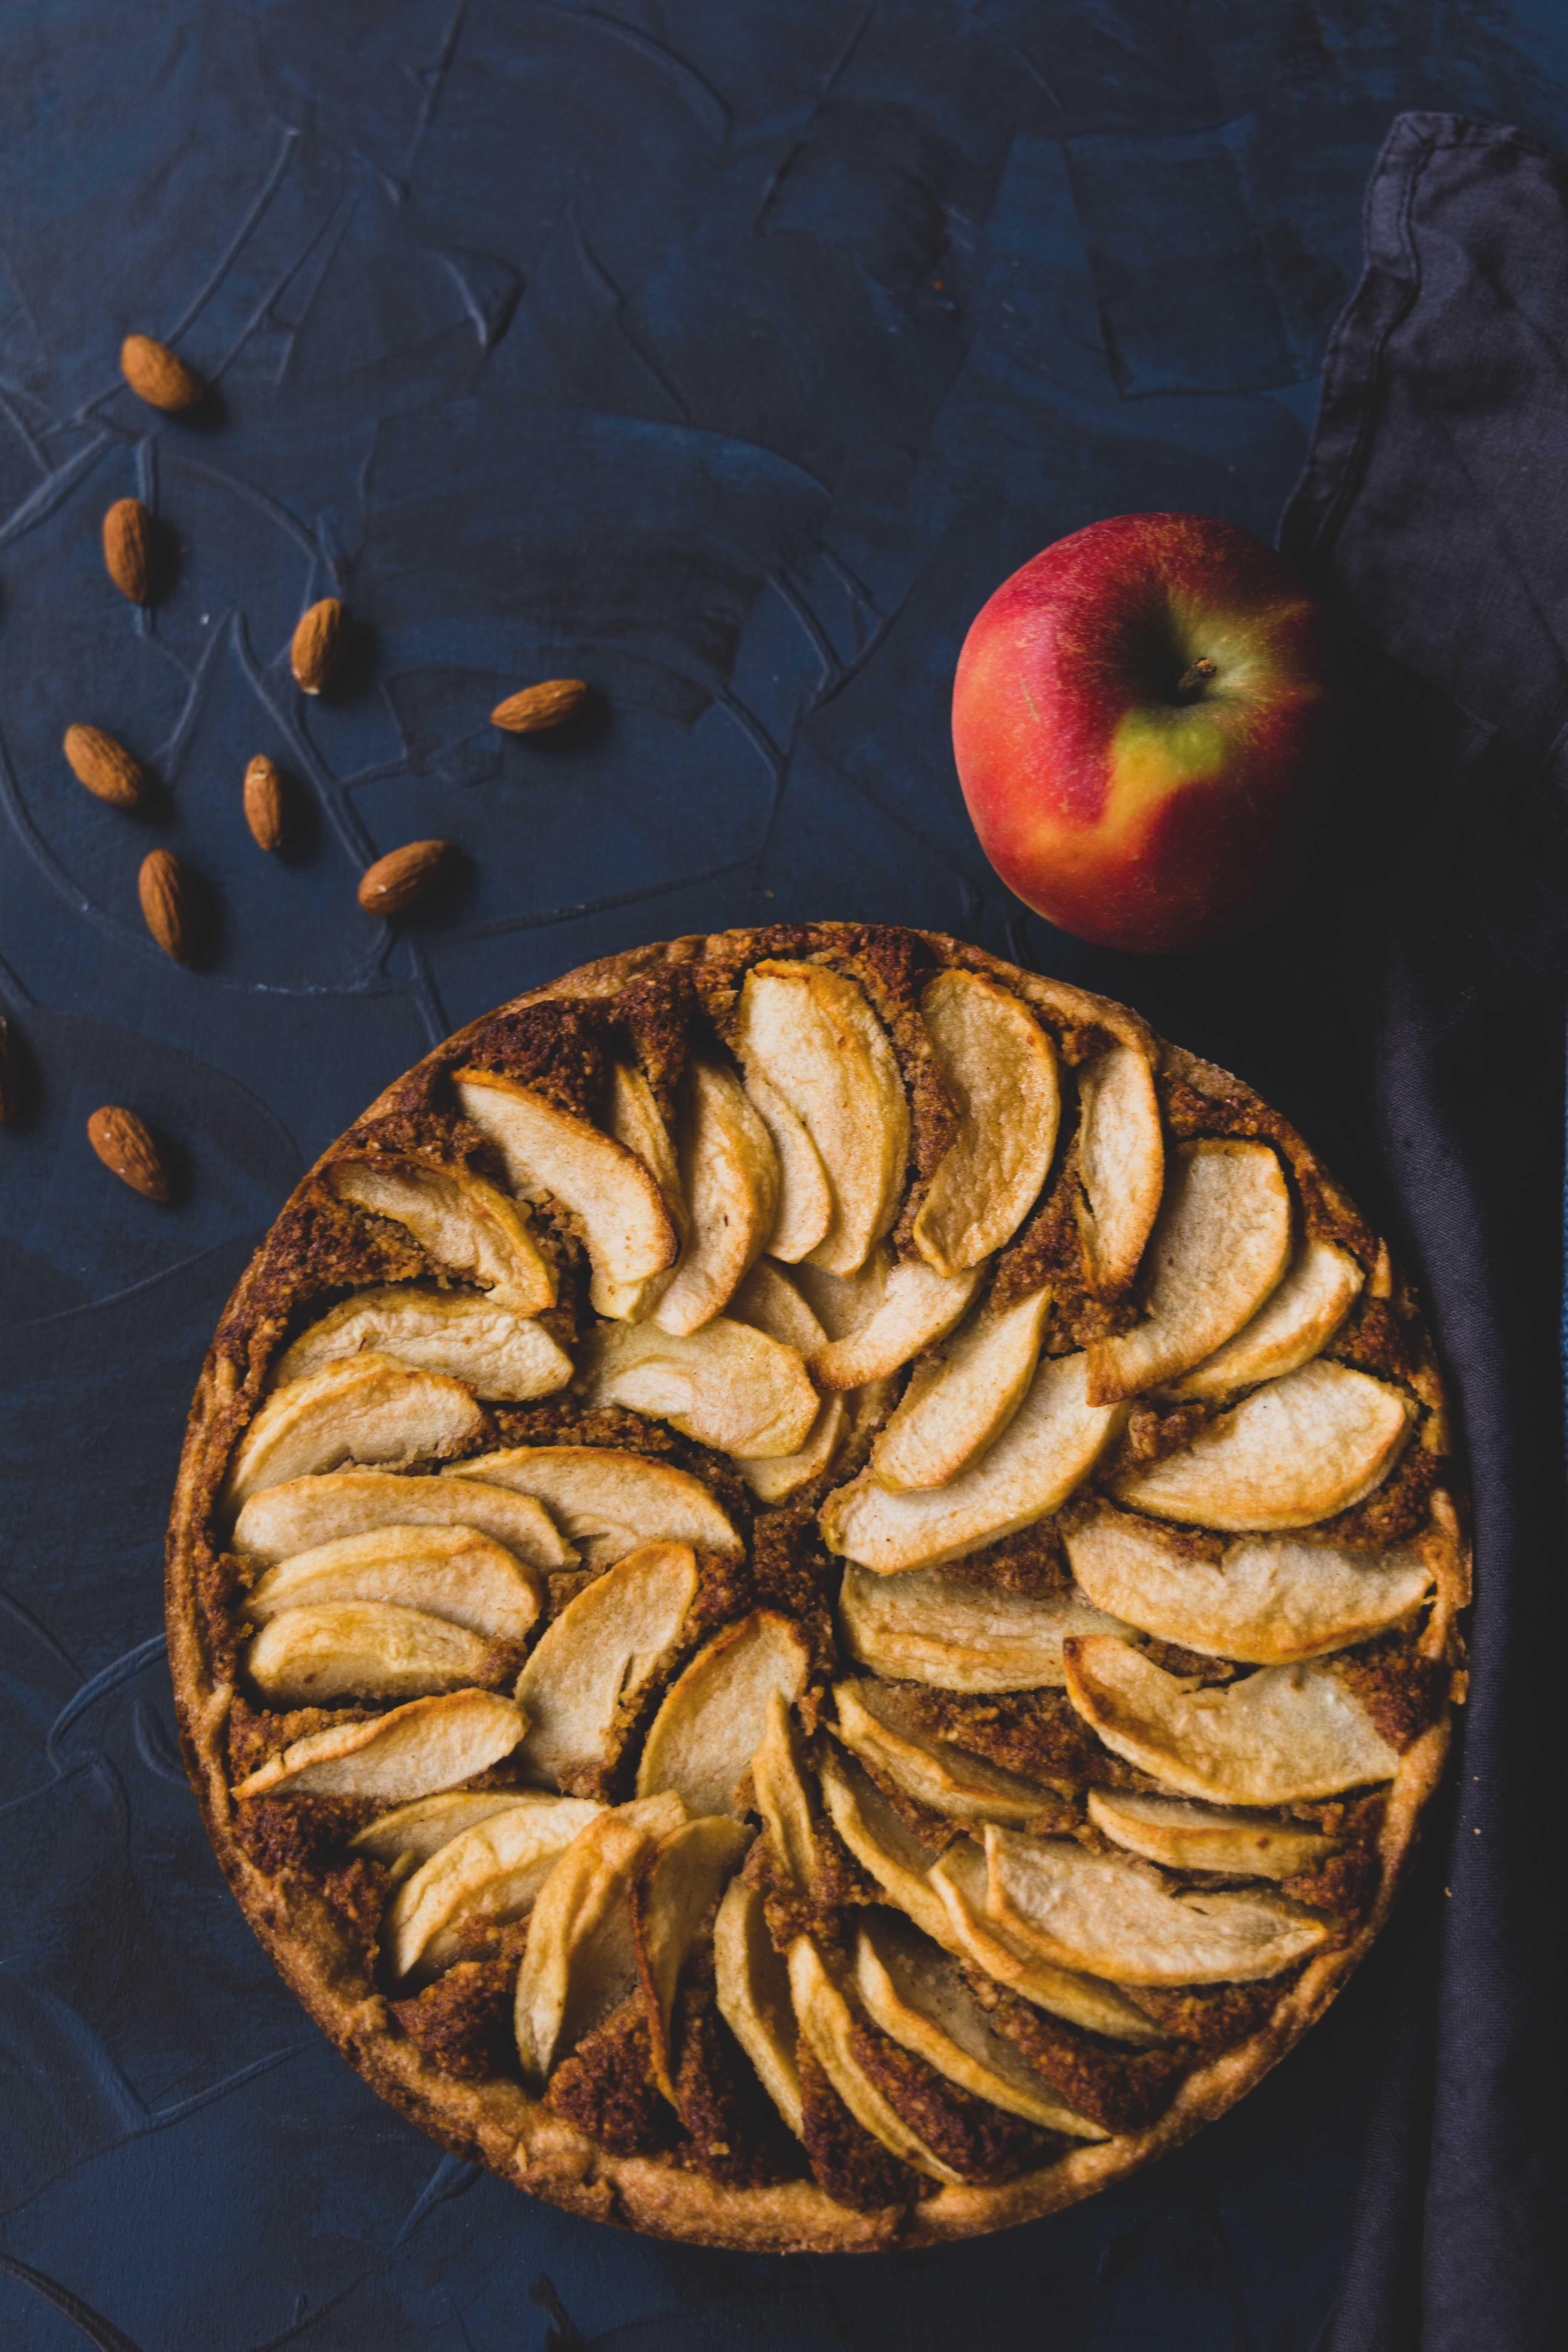 Apfel-Mandel-Kuchen mit Zimt // apple almond cake with cinnamon by https://babyrockmyday.com/apfel-mandel-kuchen/